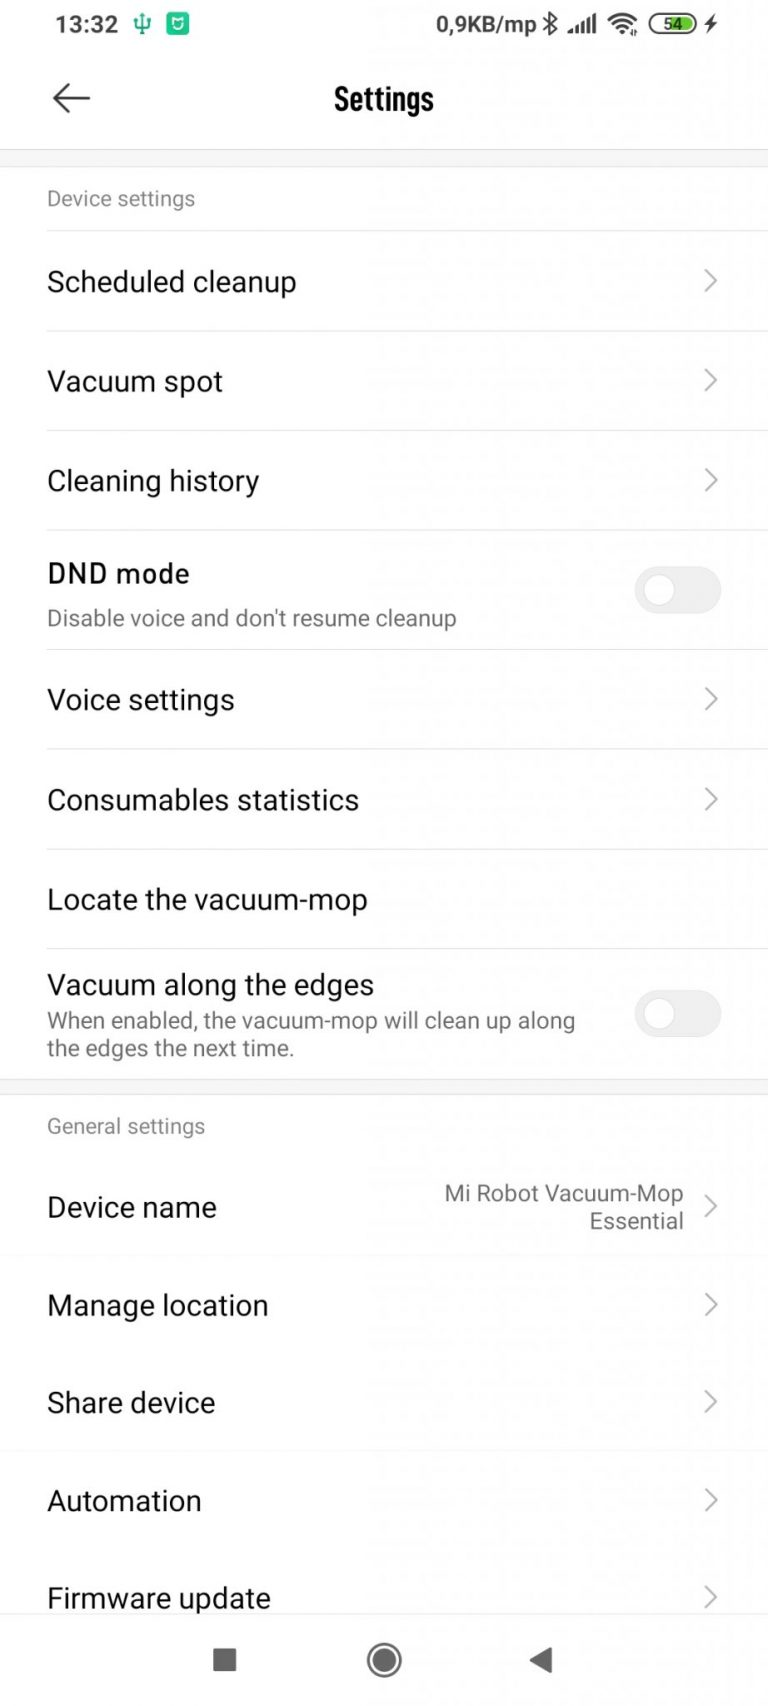 Xiaomi Vacuum-Mop Essential robotporszívó teszt 23